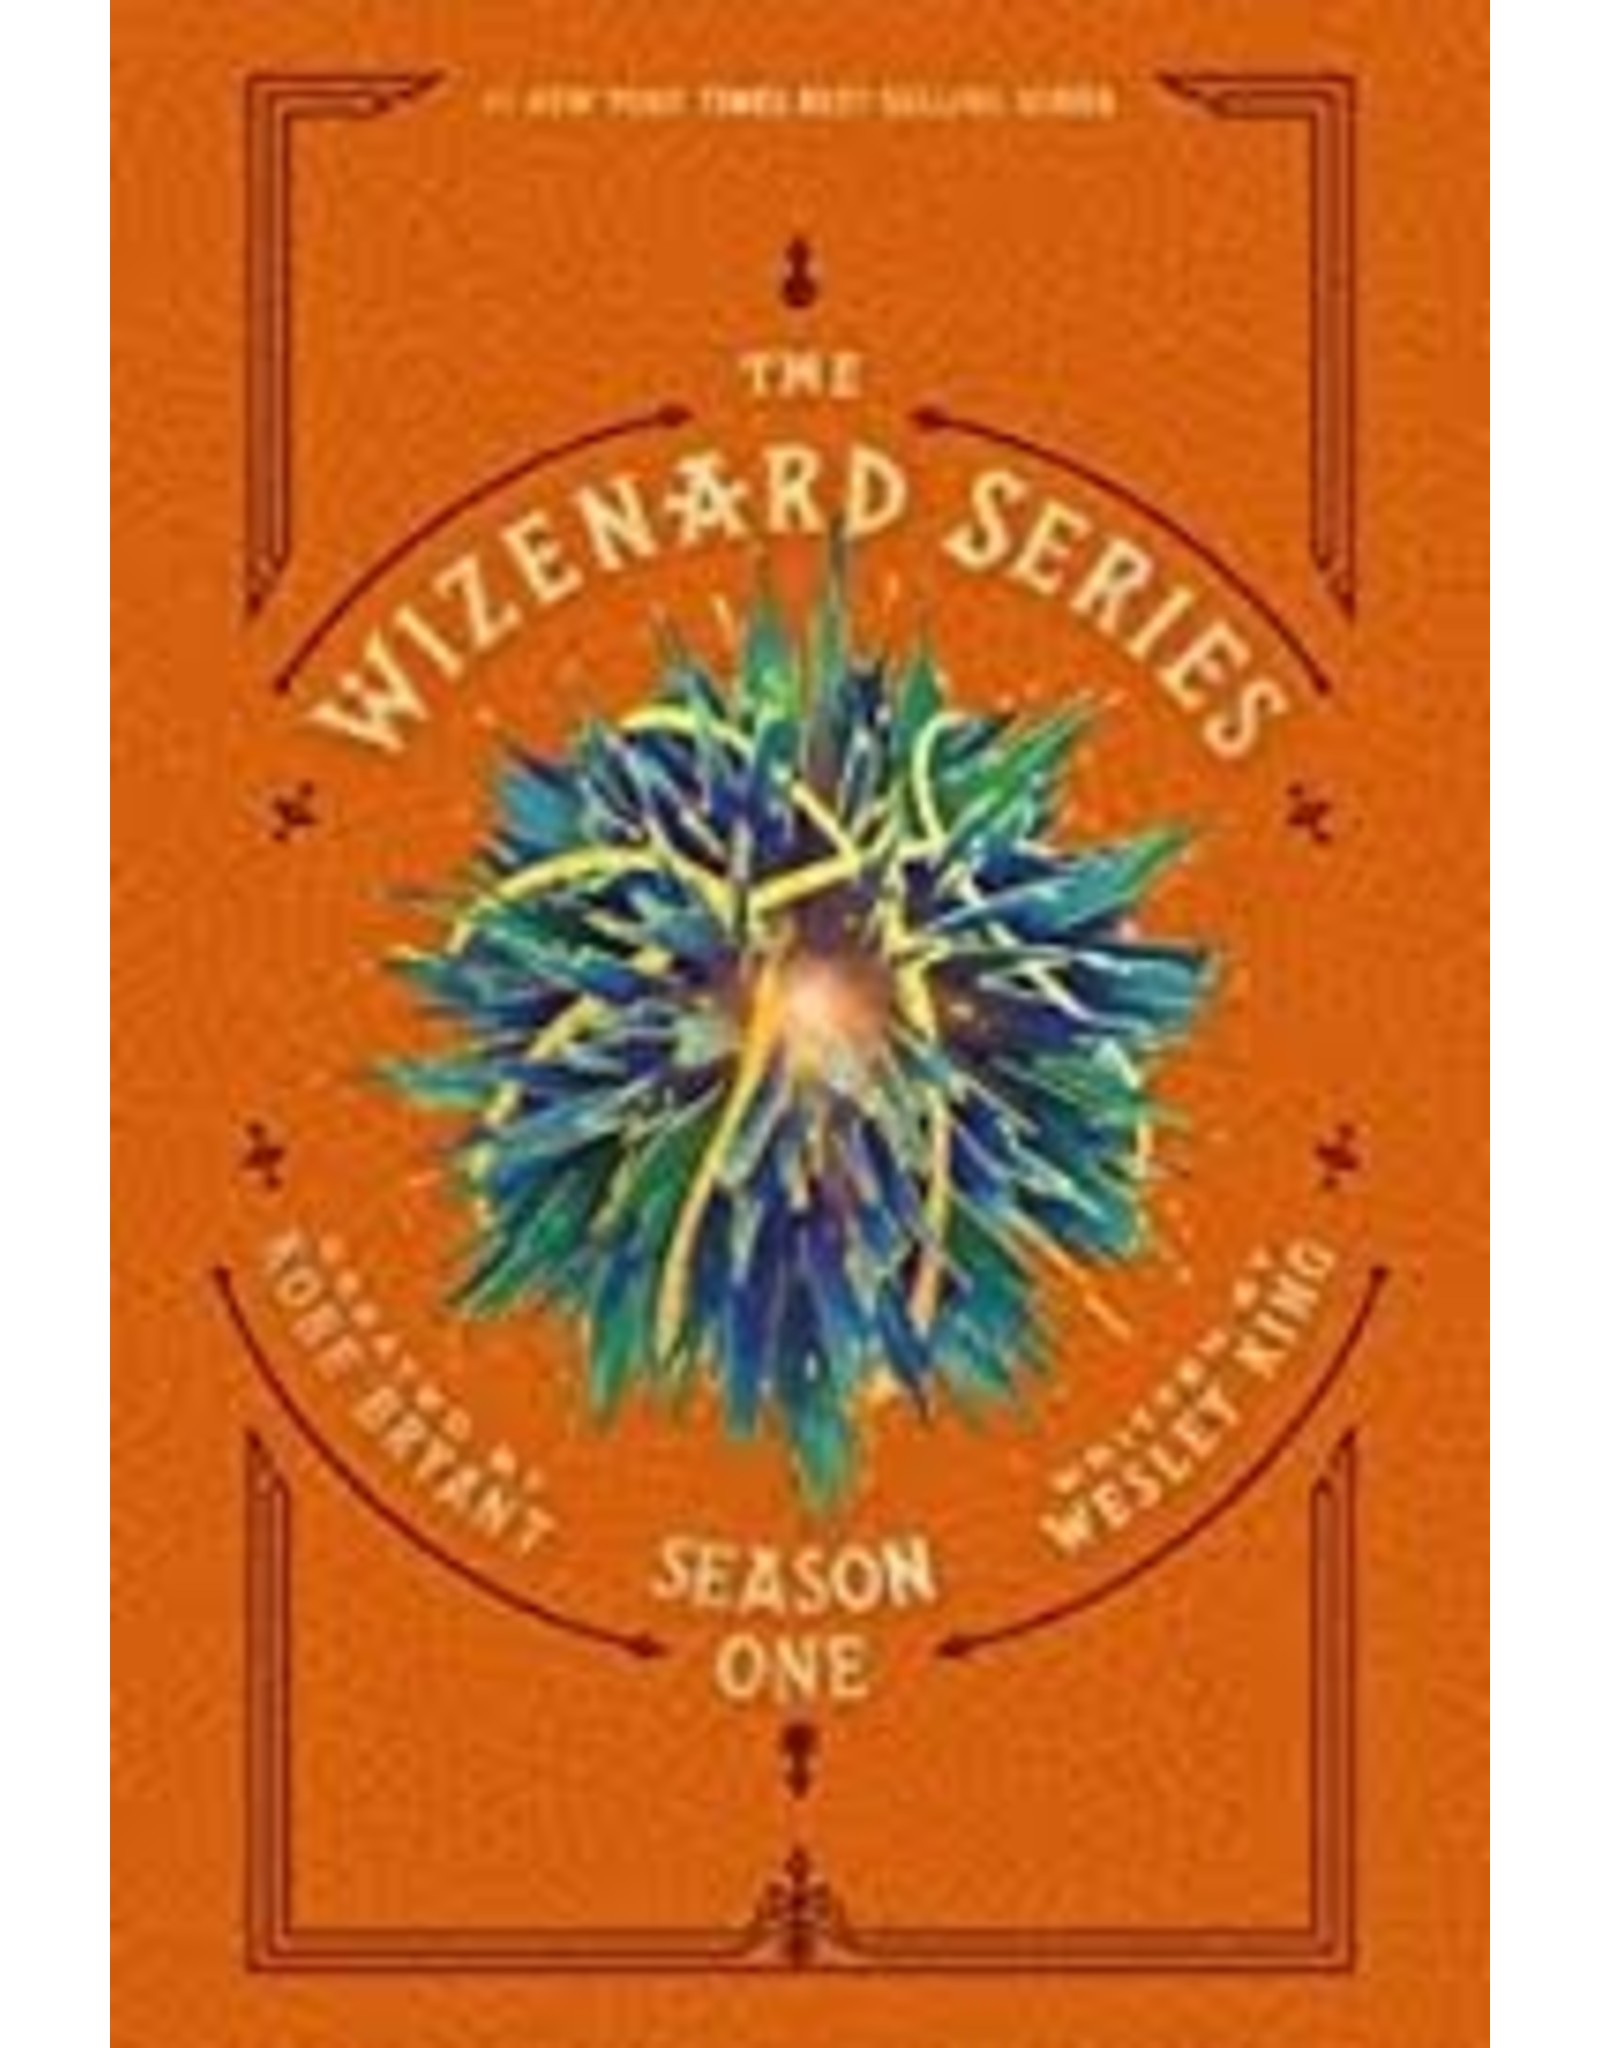 Books The Wizenard Series: Season One